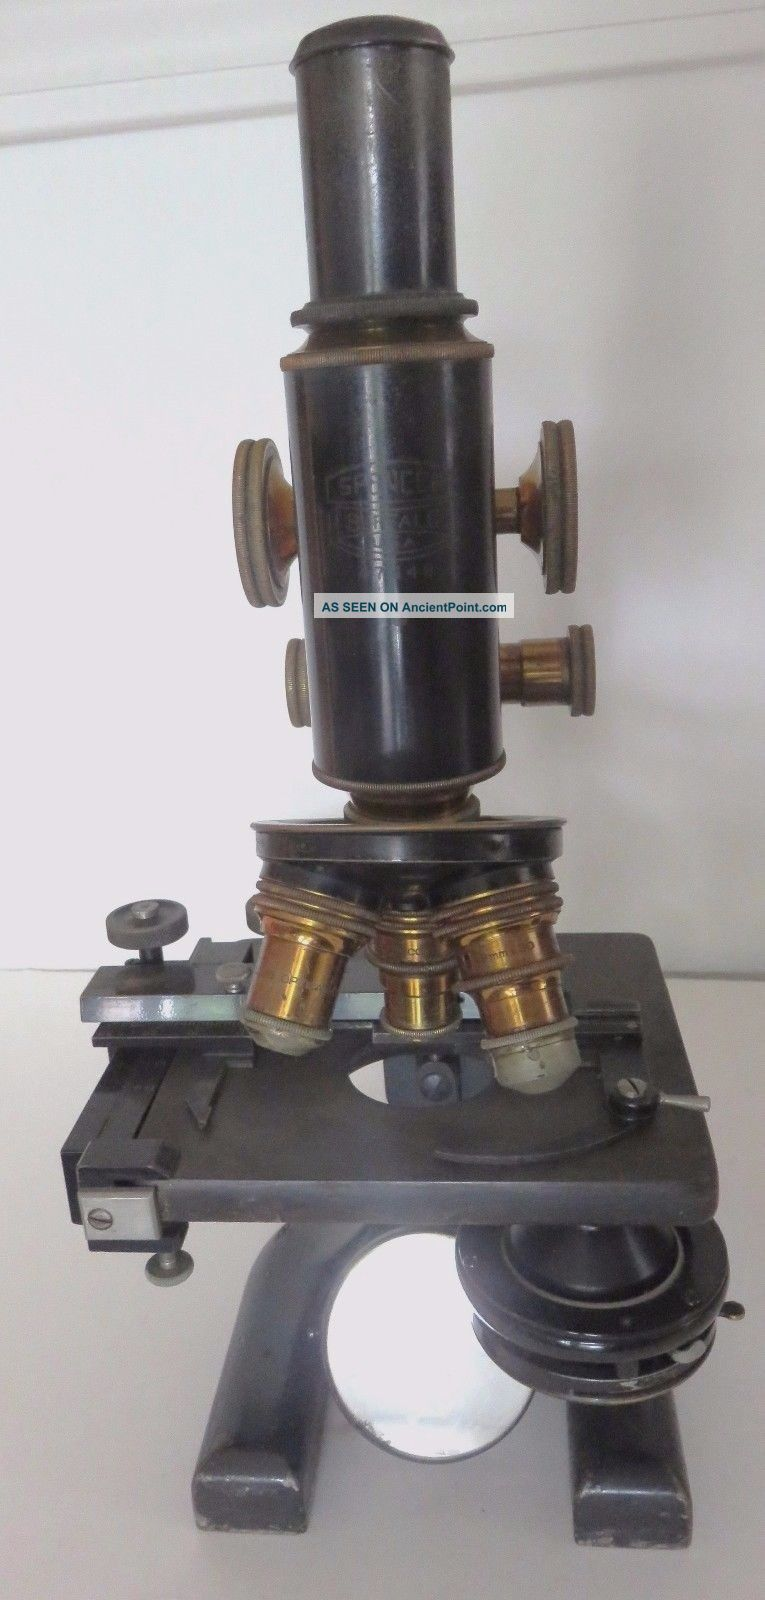 Vintage Antique Spencer Monocular Microscope W/ Wooden Case Circa 1900 Microscopes & Lab Equipment photo